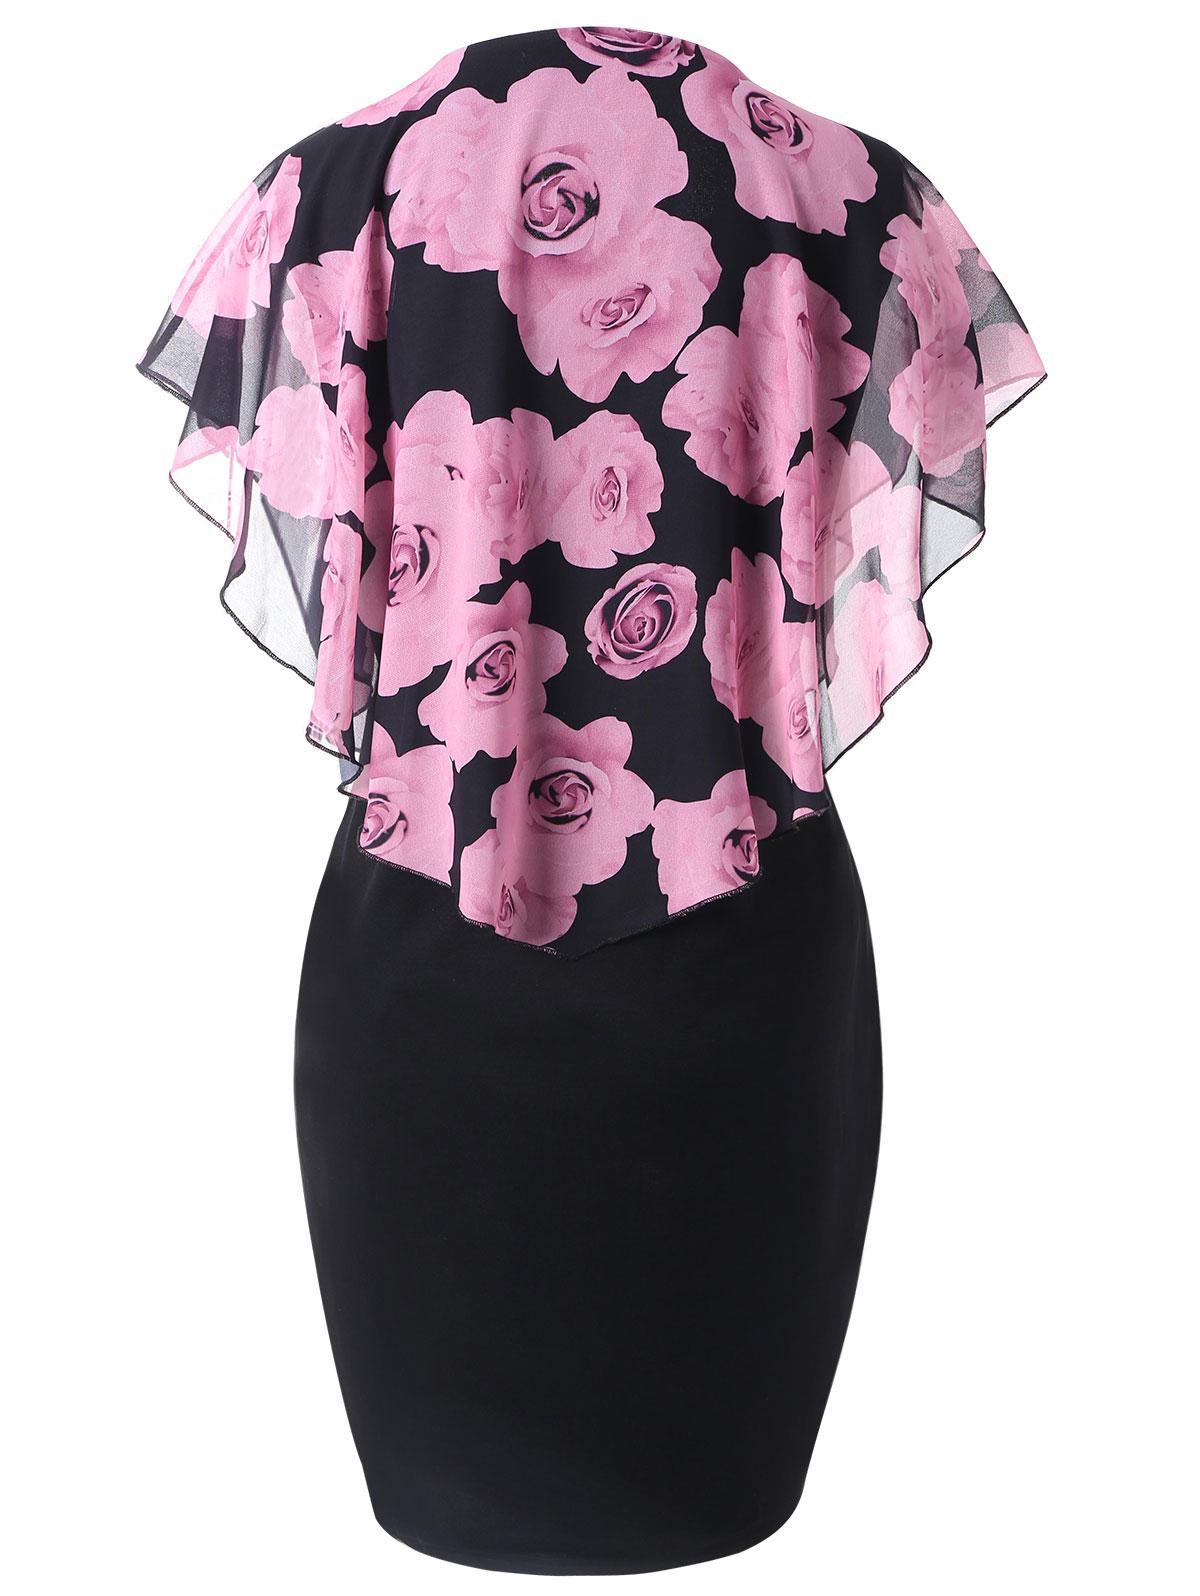 558270af2d1 Neckline  Round Collar Sleeve Length  Short Sleeves Pattern Type  Floral  With Belt  No Season  Spring